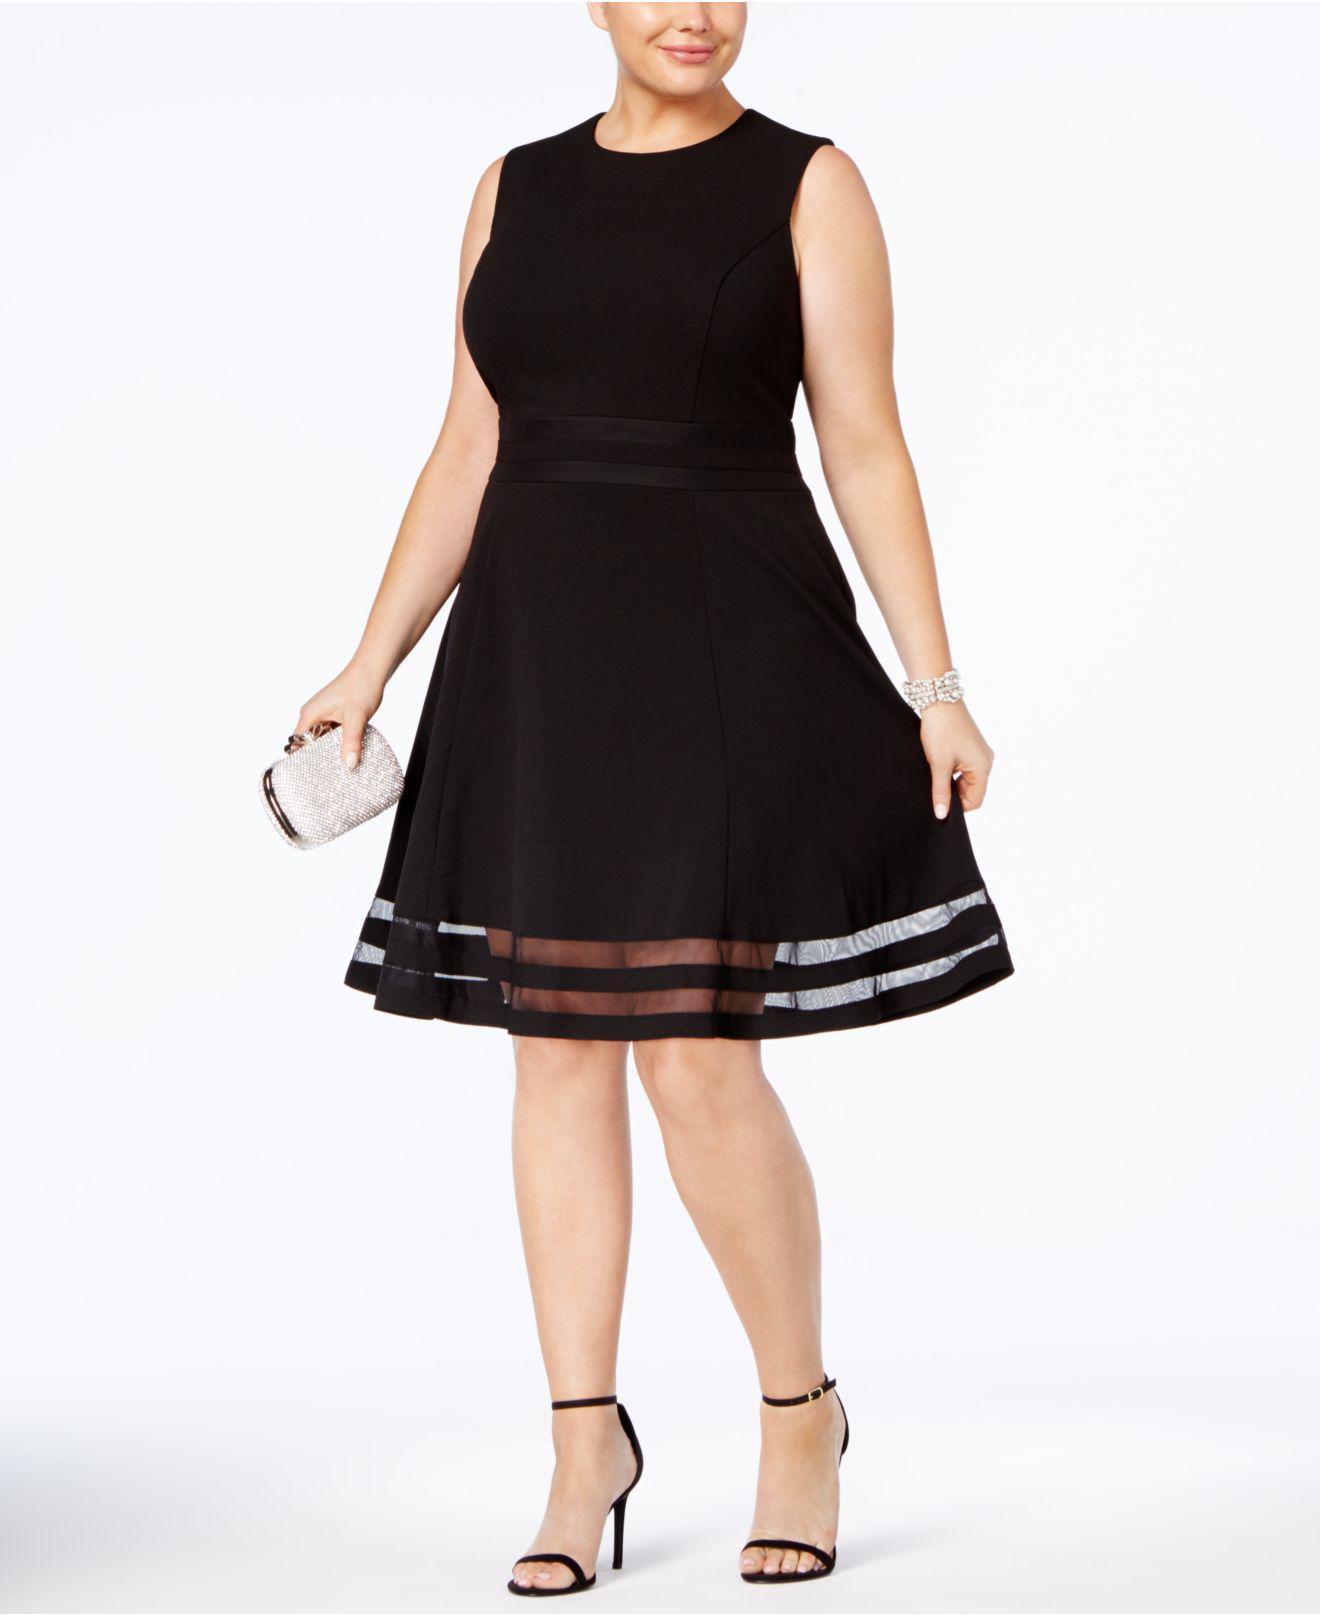 49716bac5ba02 Lyst - Calvin Klein Plus Size Illusion-trim Fit   Flare Dress in Black